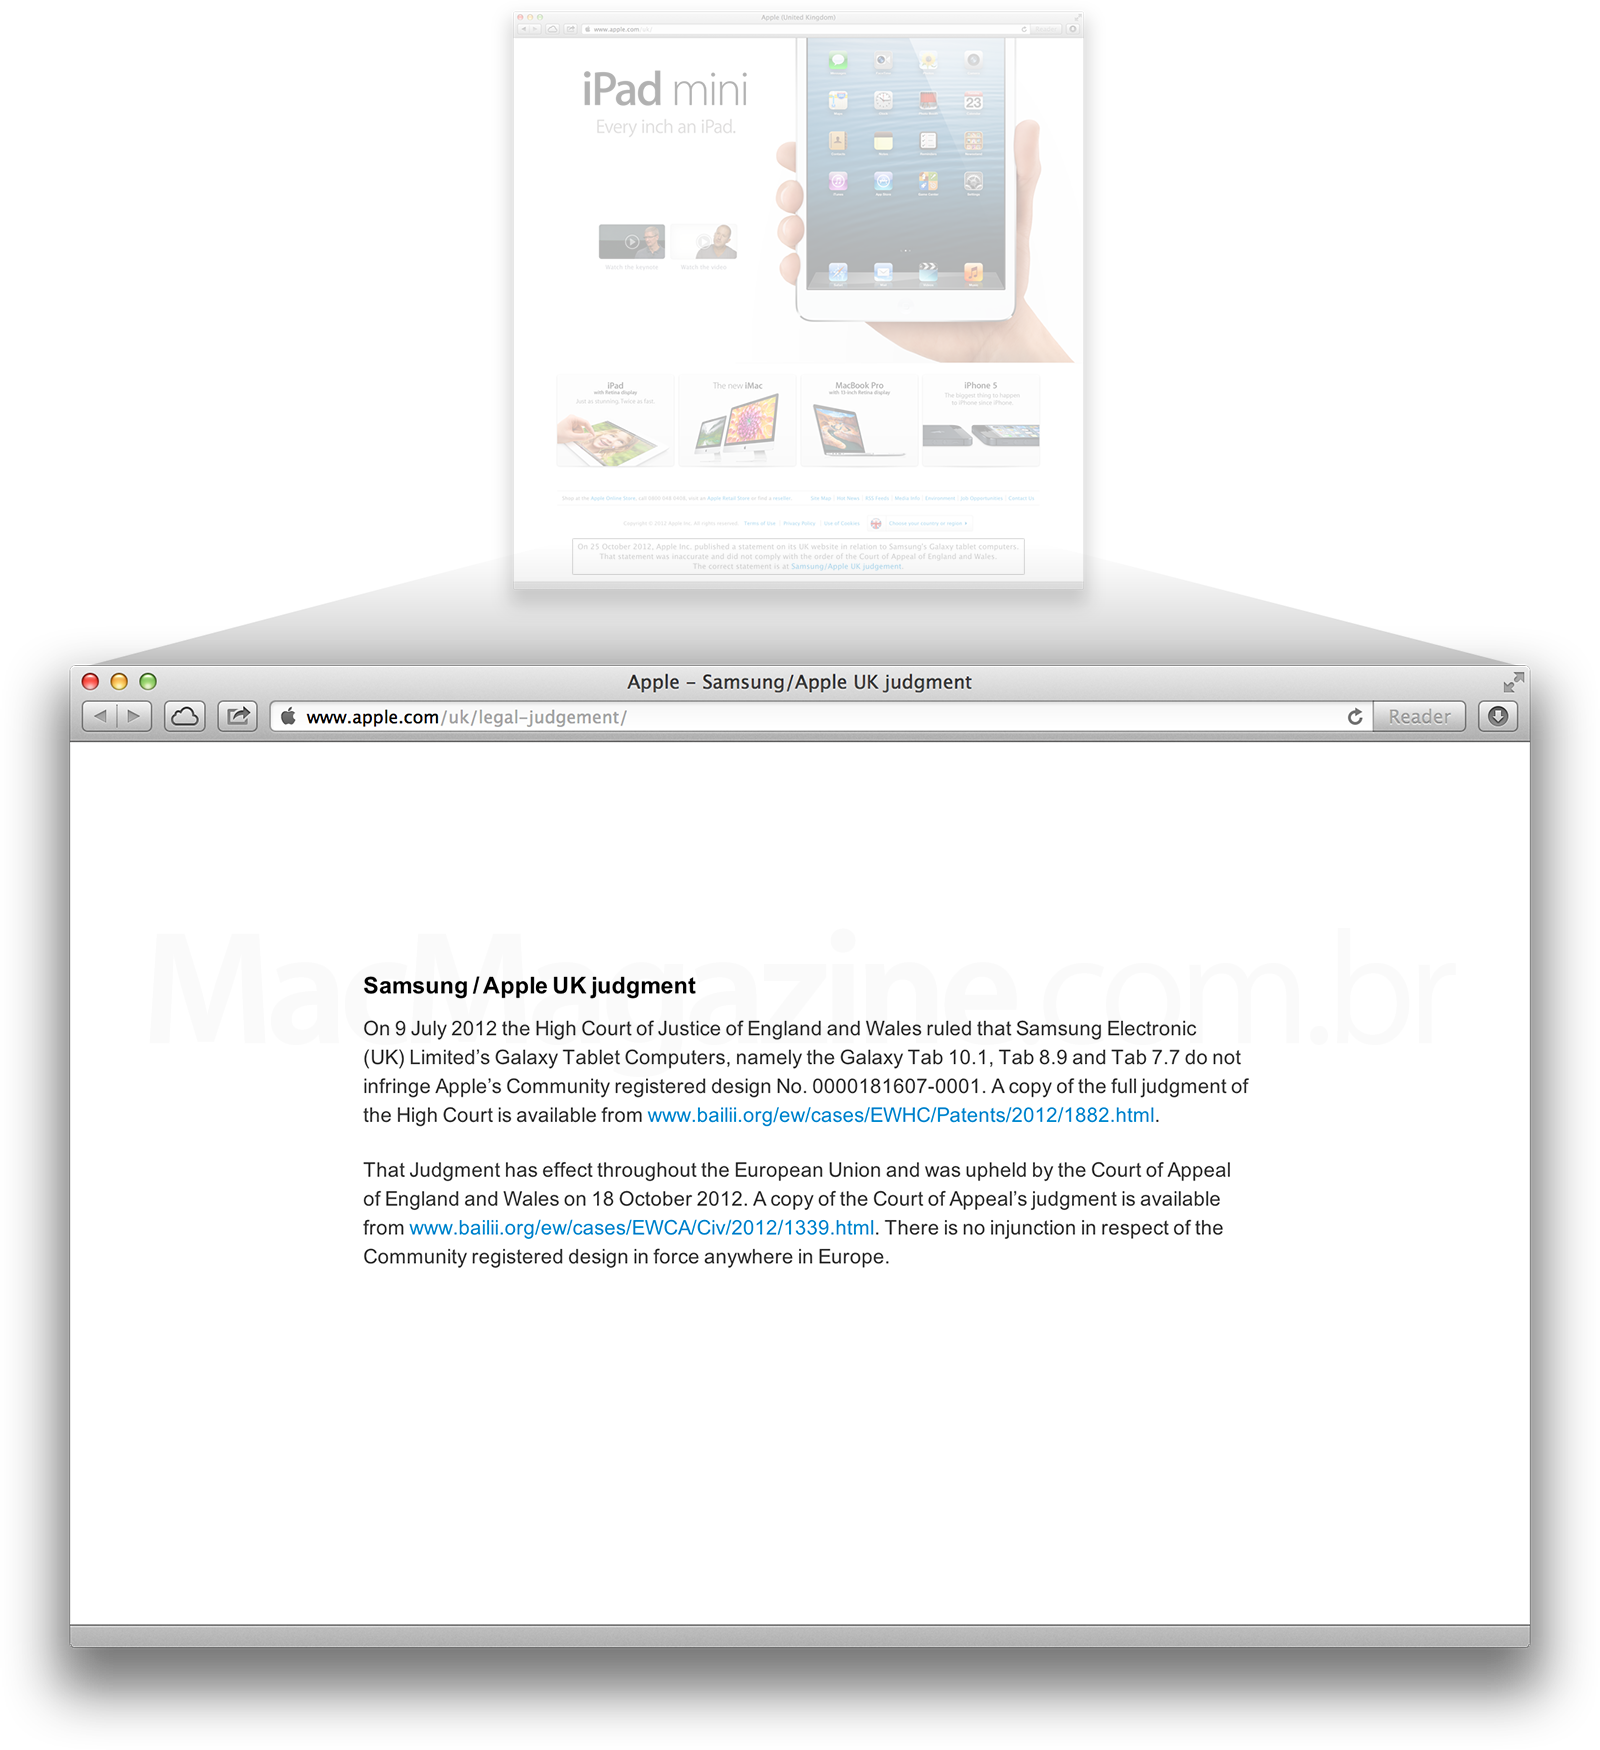 Pedido de desculpas da Apple à Samsung